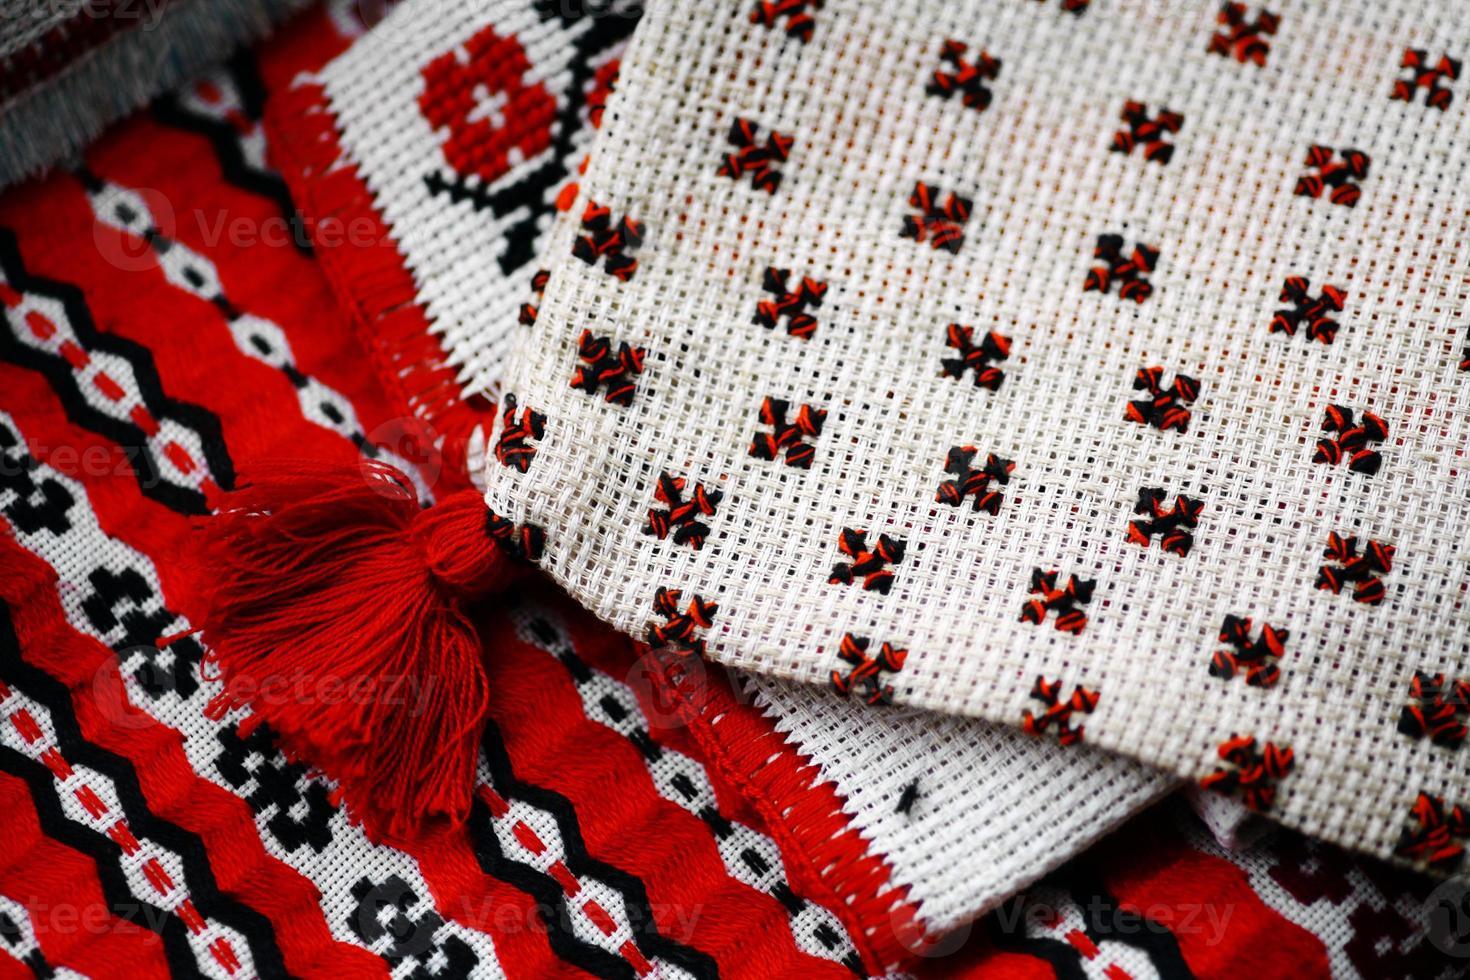 tecido romeno foto